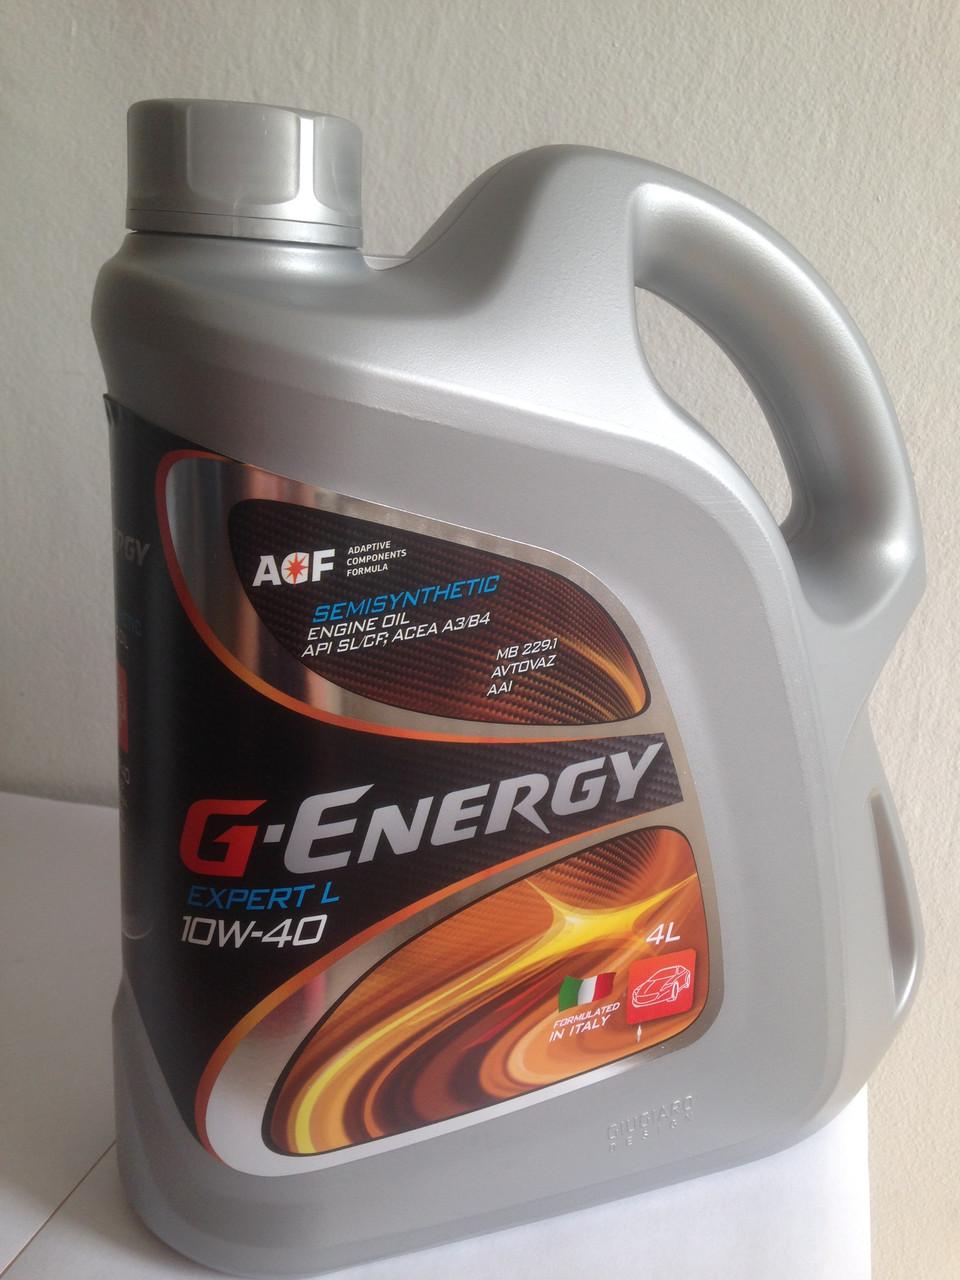 G-Energy Expert-L 10w40 полусинтетическое моторное масло 4л.